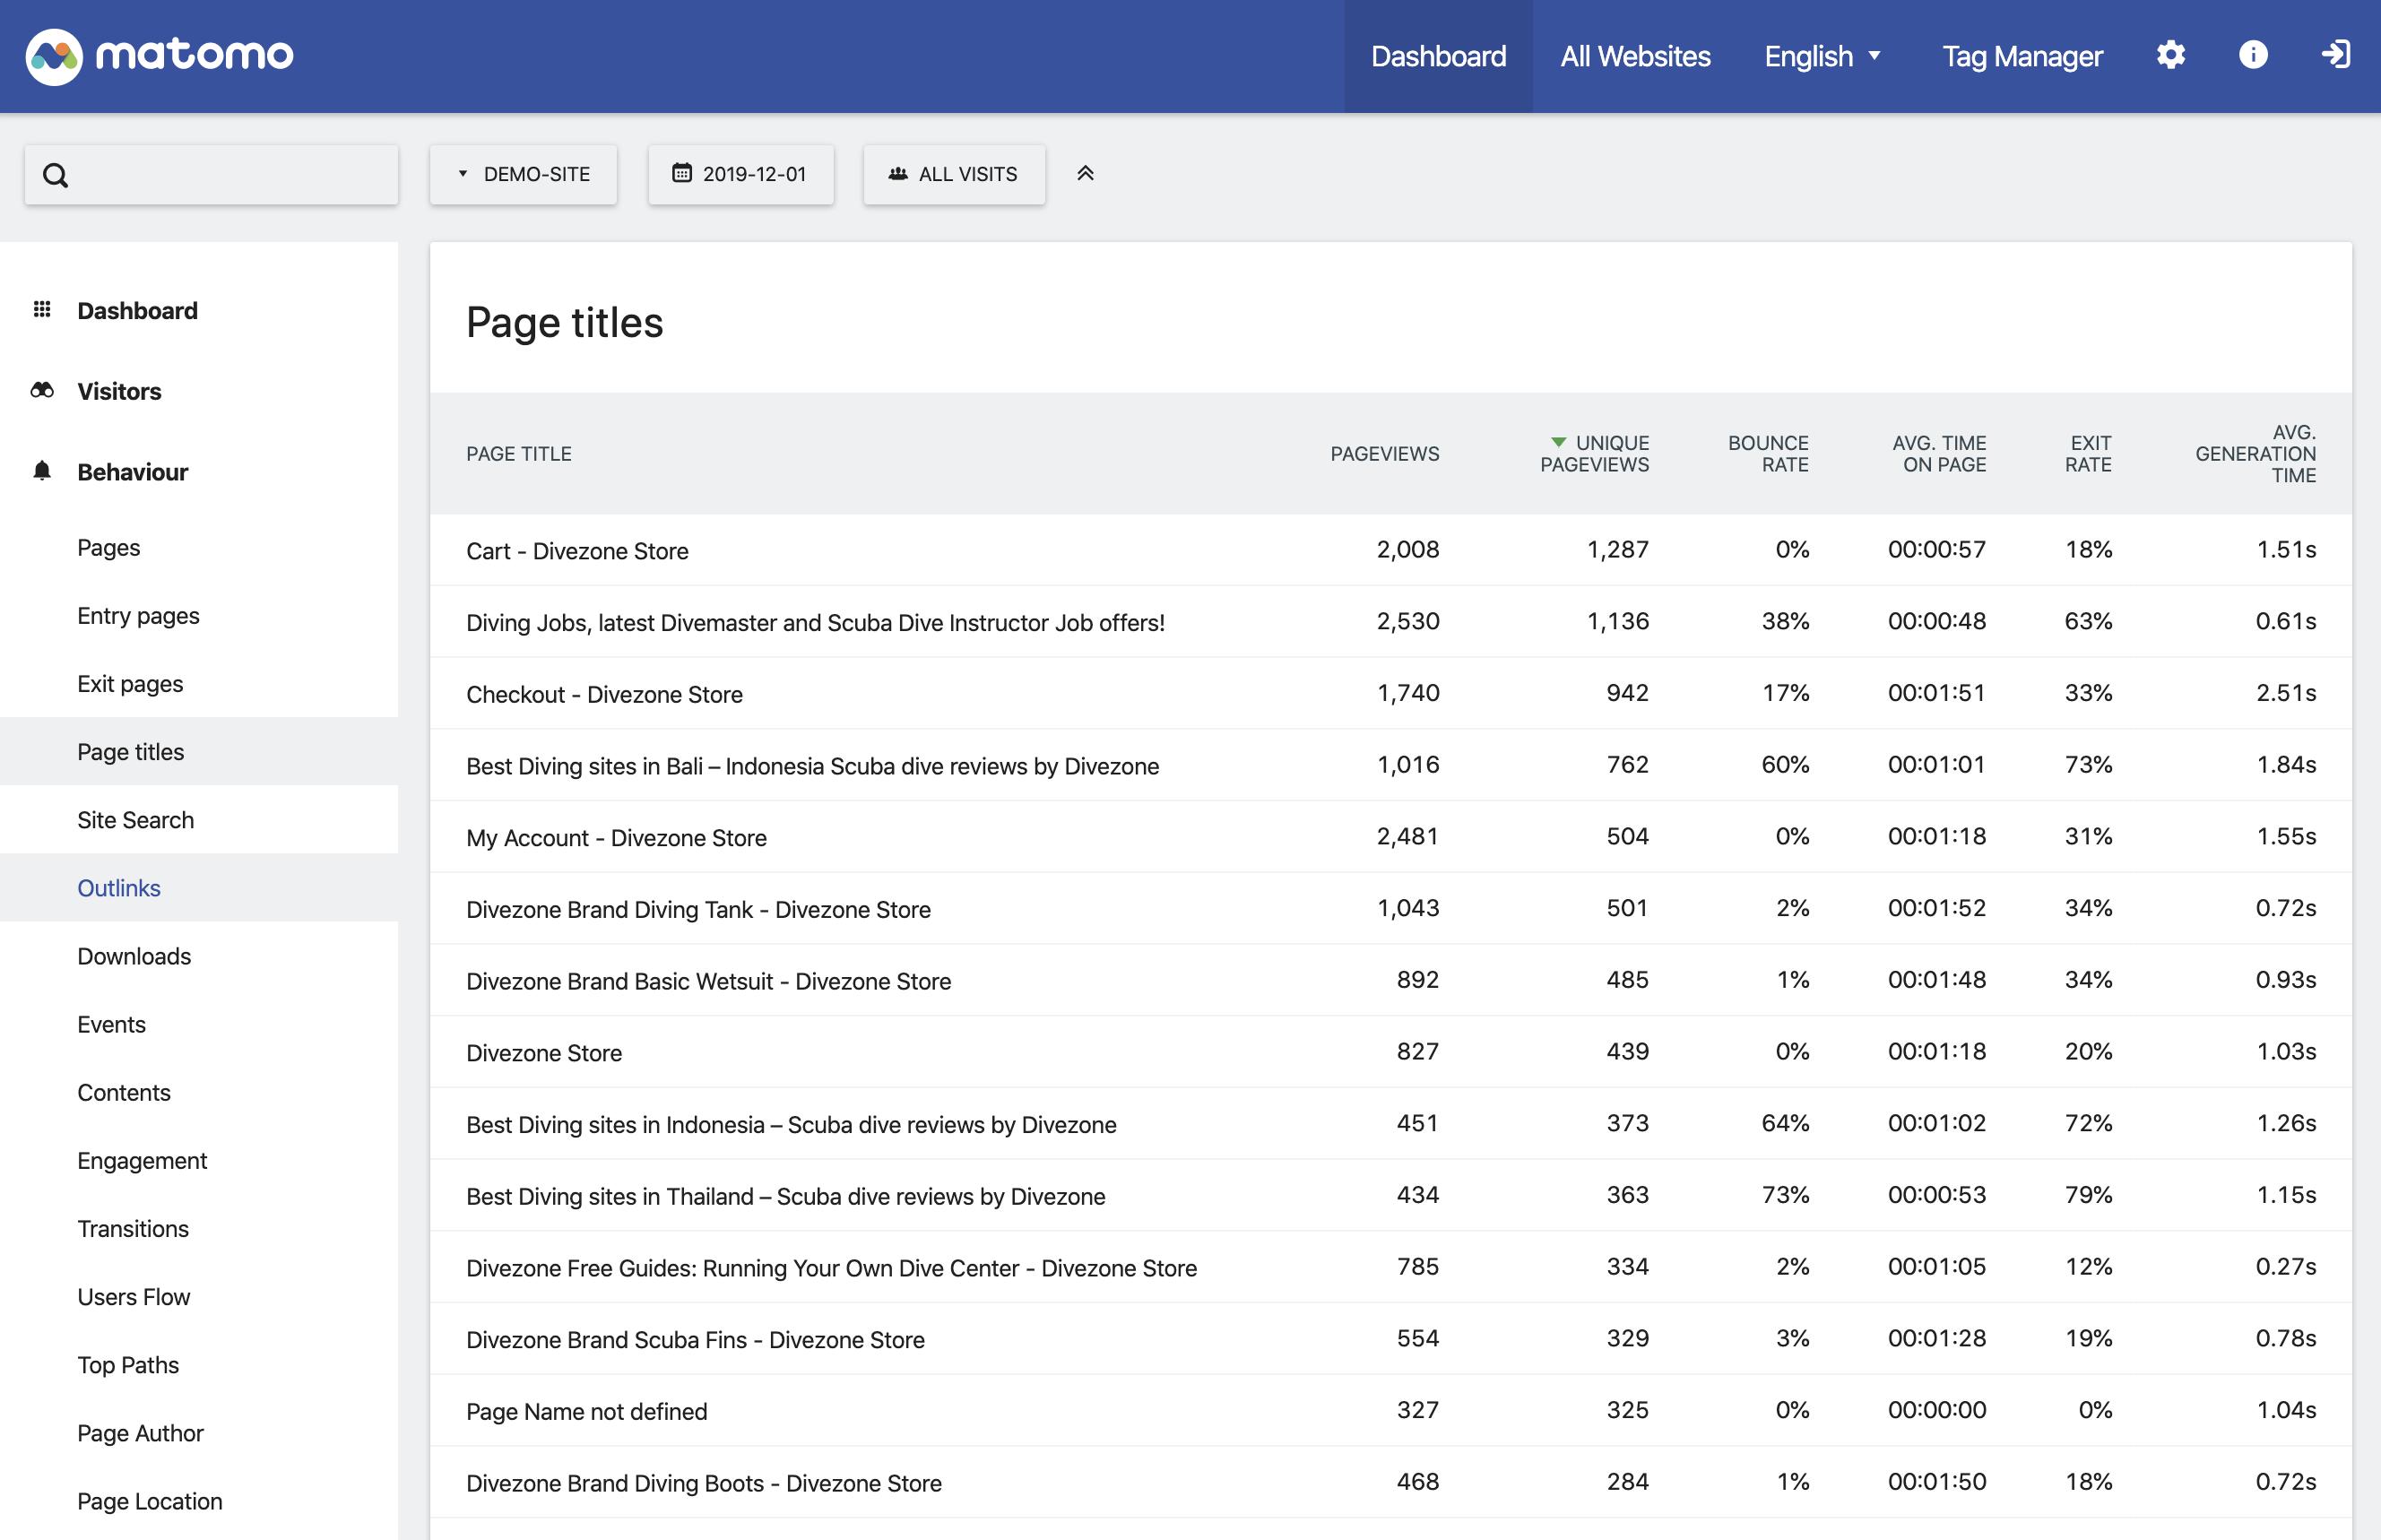 Matomo Analytics – Ethical Stats. Powerful Insights.